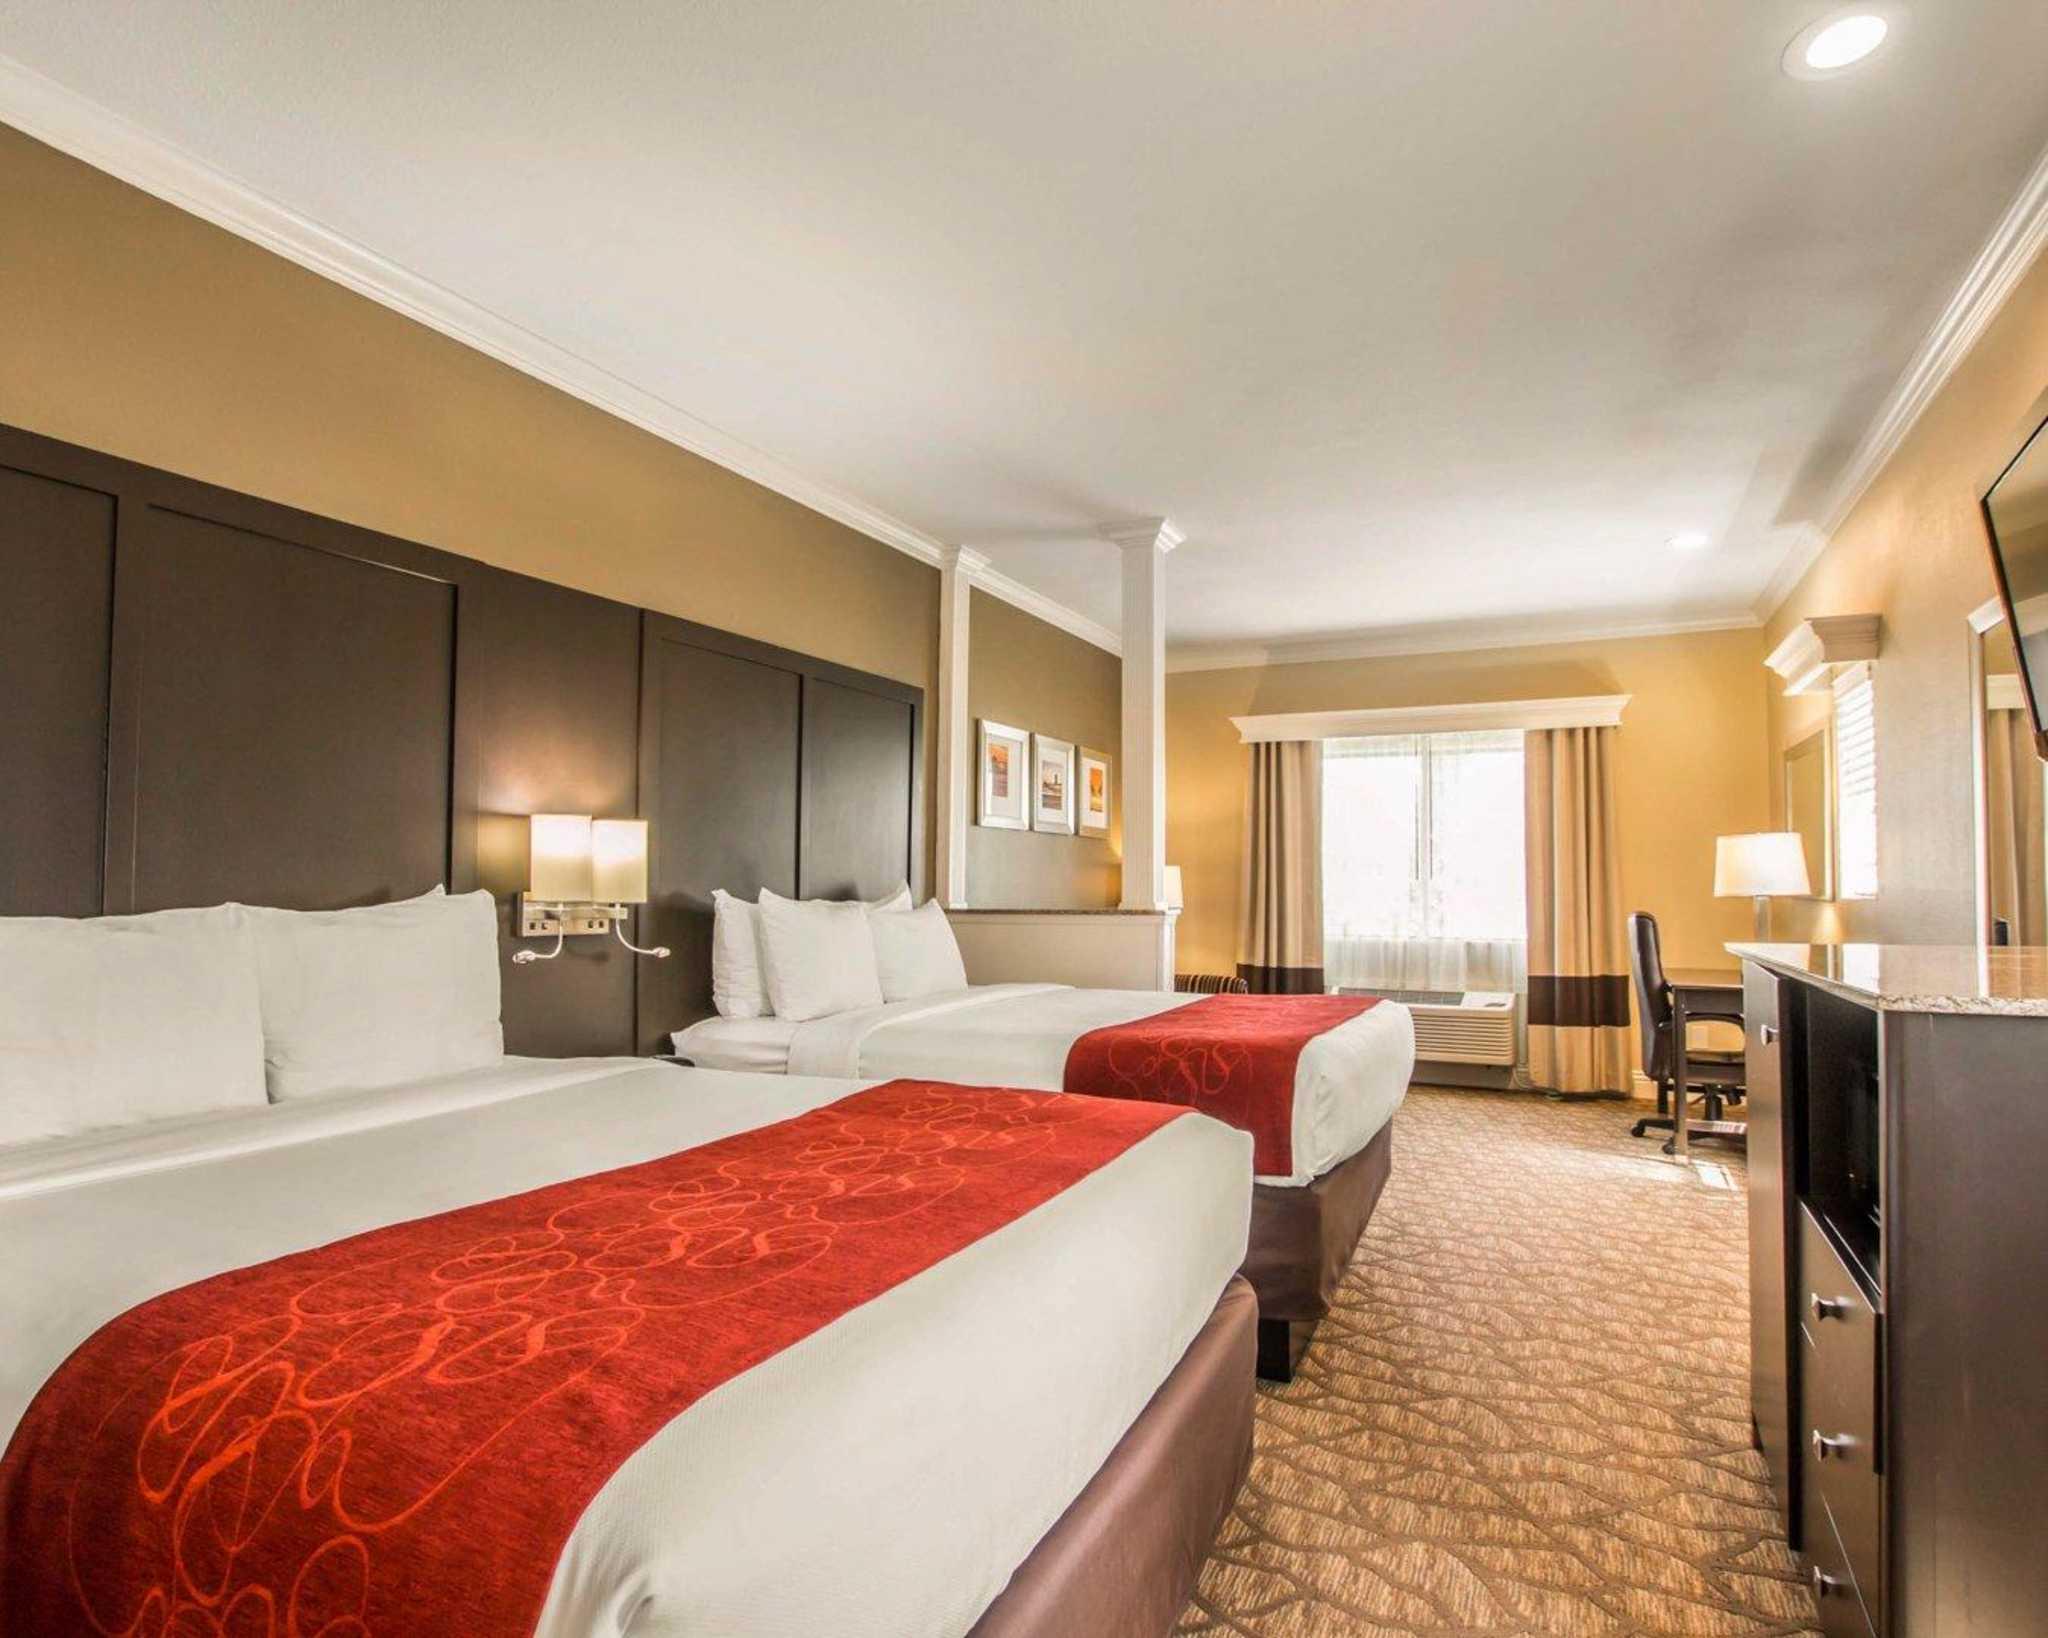 Comfort Suites Huntington Beach image 6